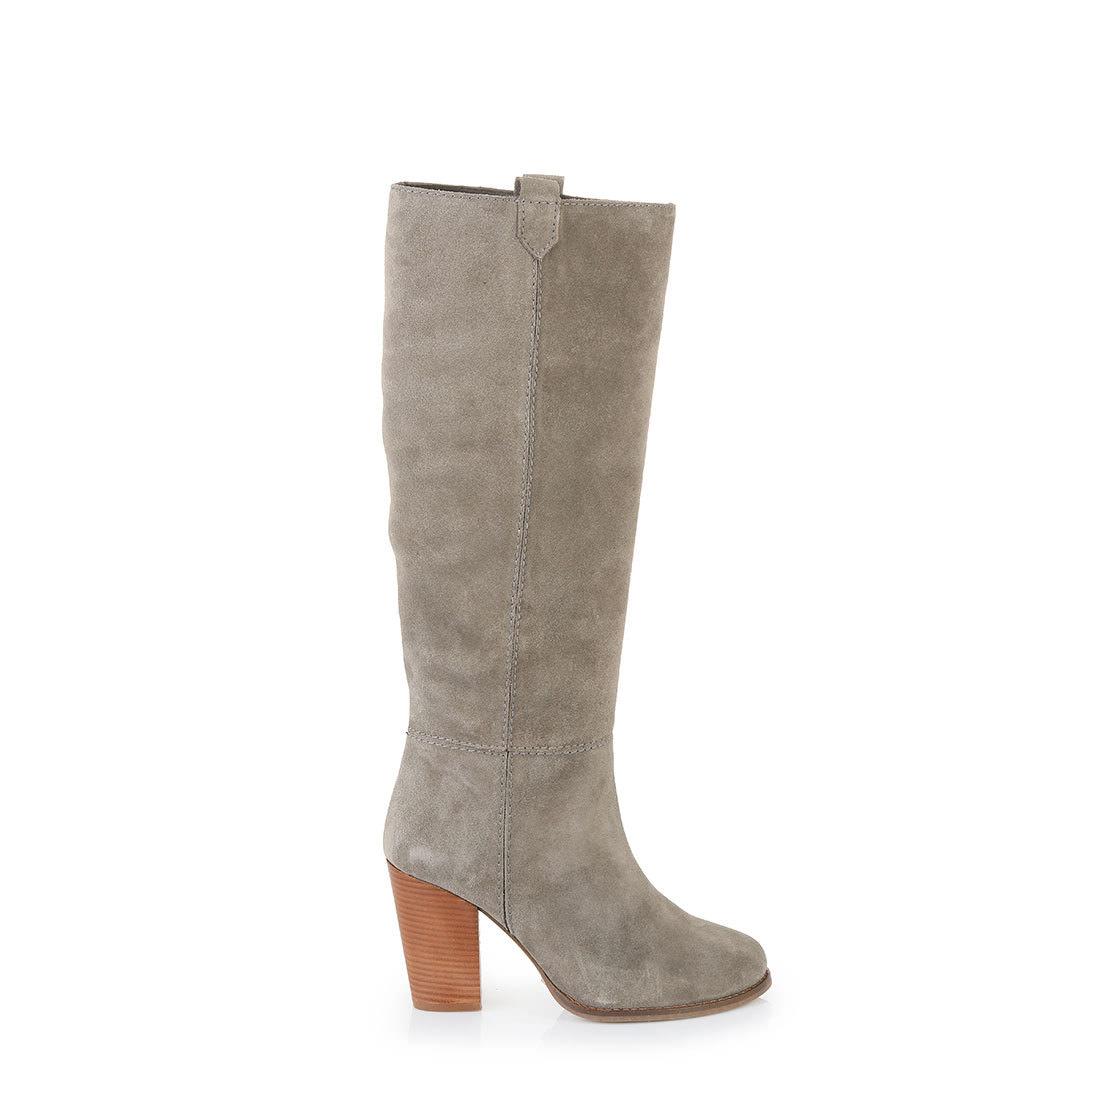 super popular 3fbd2 b1228 Buffalo Stiefel in grau mit Absatz online kaufen | BUFFALO®